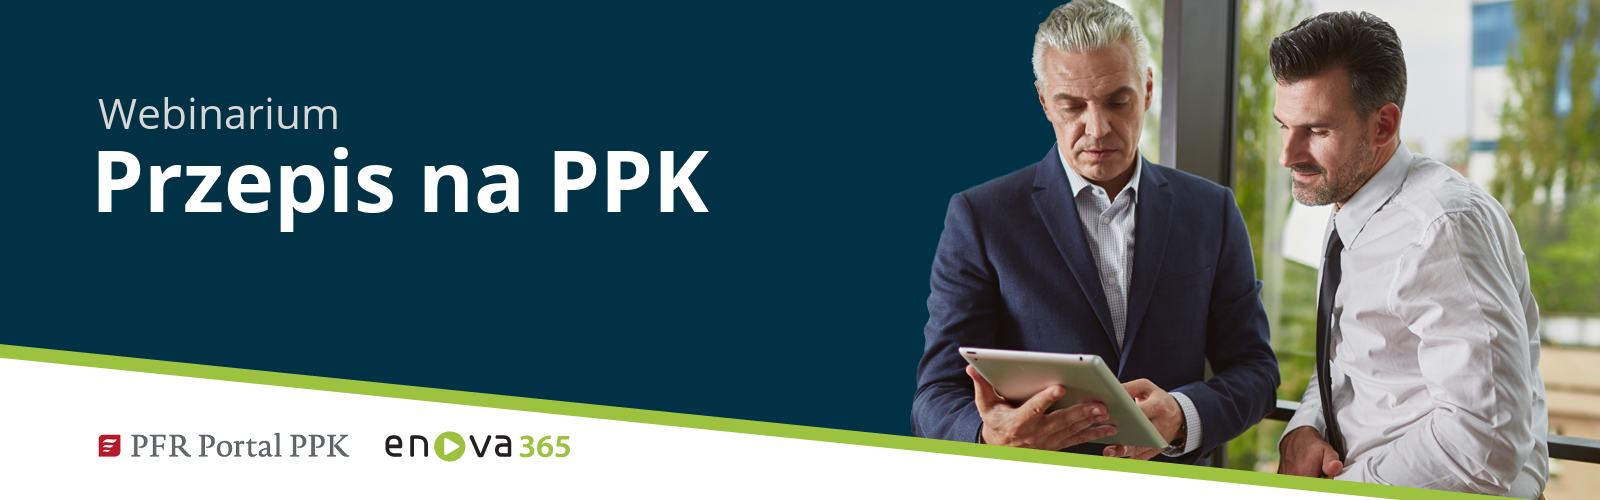 webinarium przepis na PPK